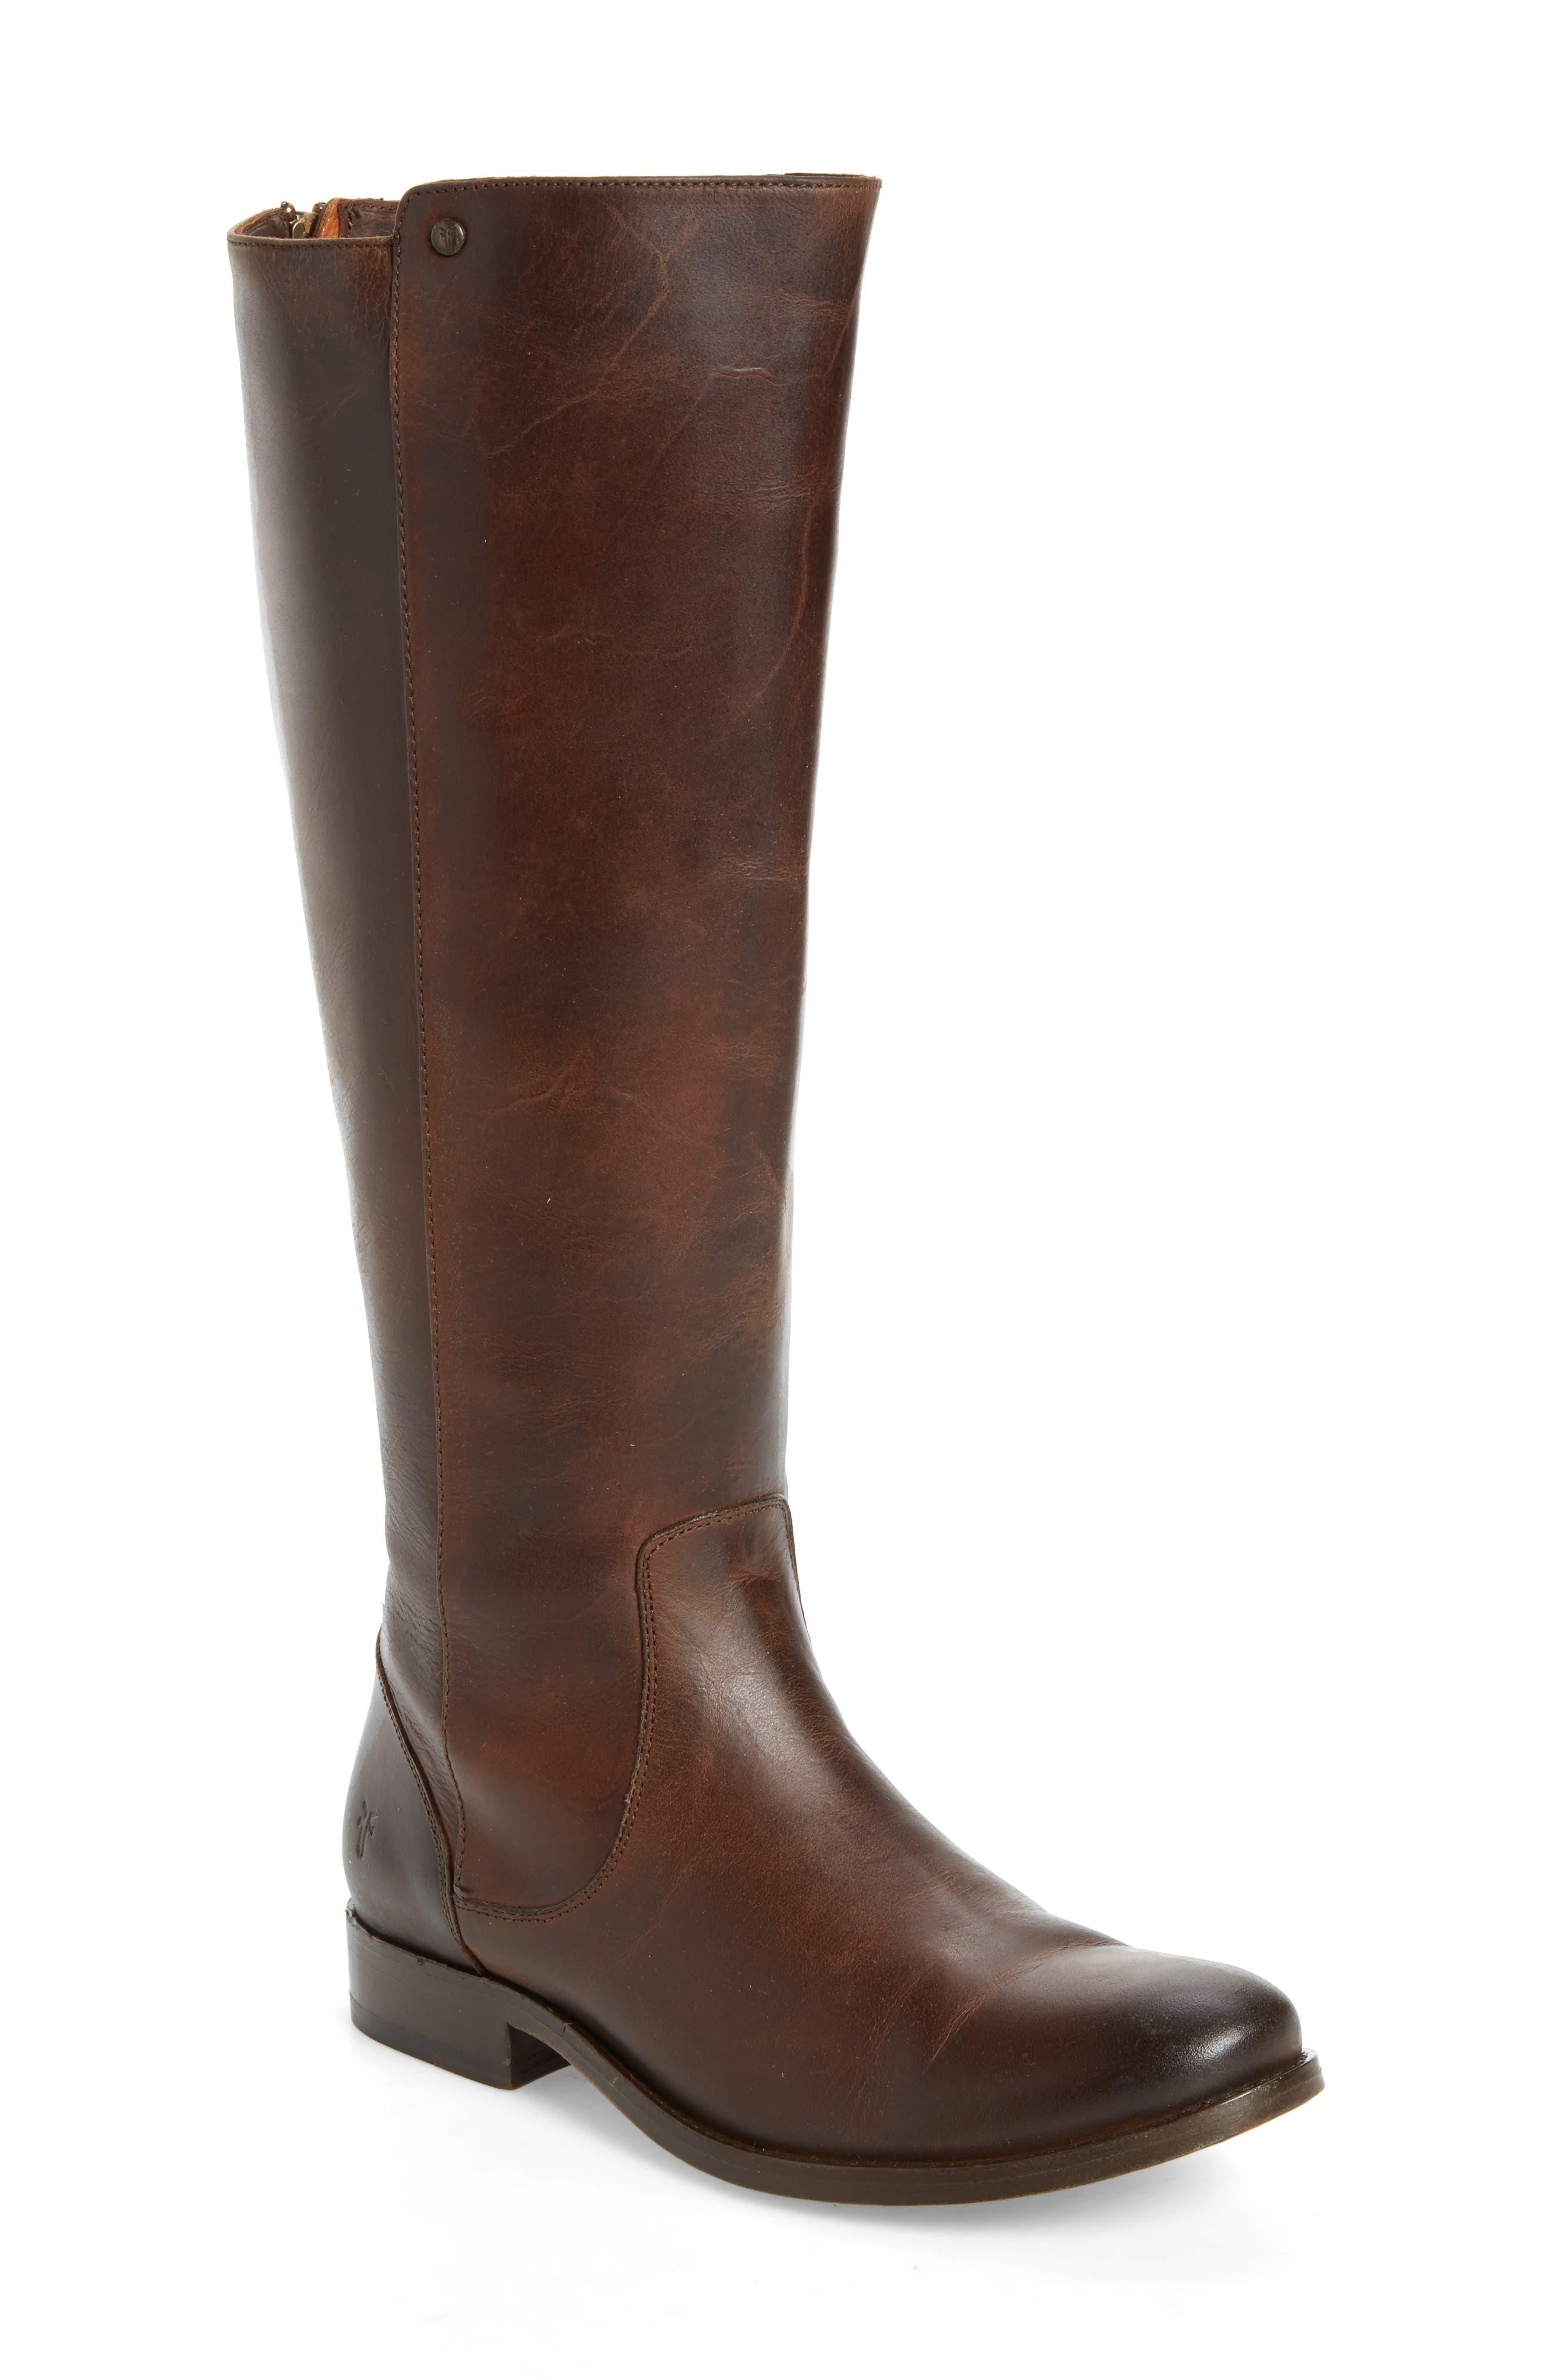 Melissa Stud Knee High Boot,                             Main thumbnail 1, color,                             Chocolate Leather